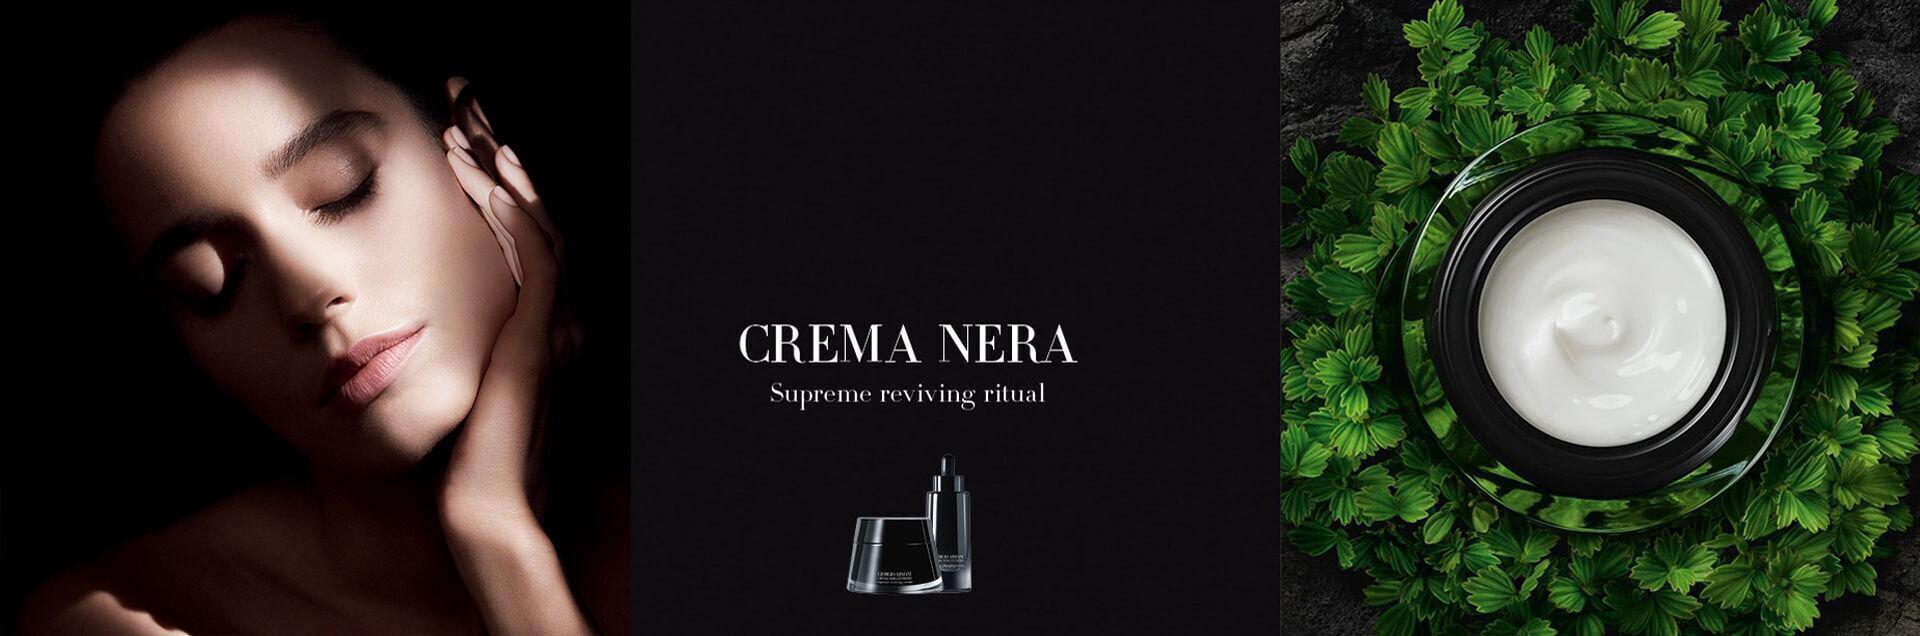 Crema Nera